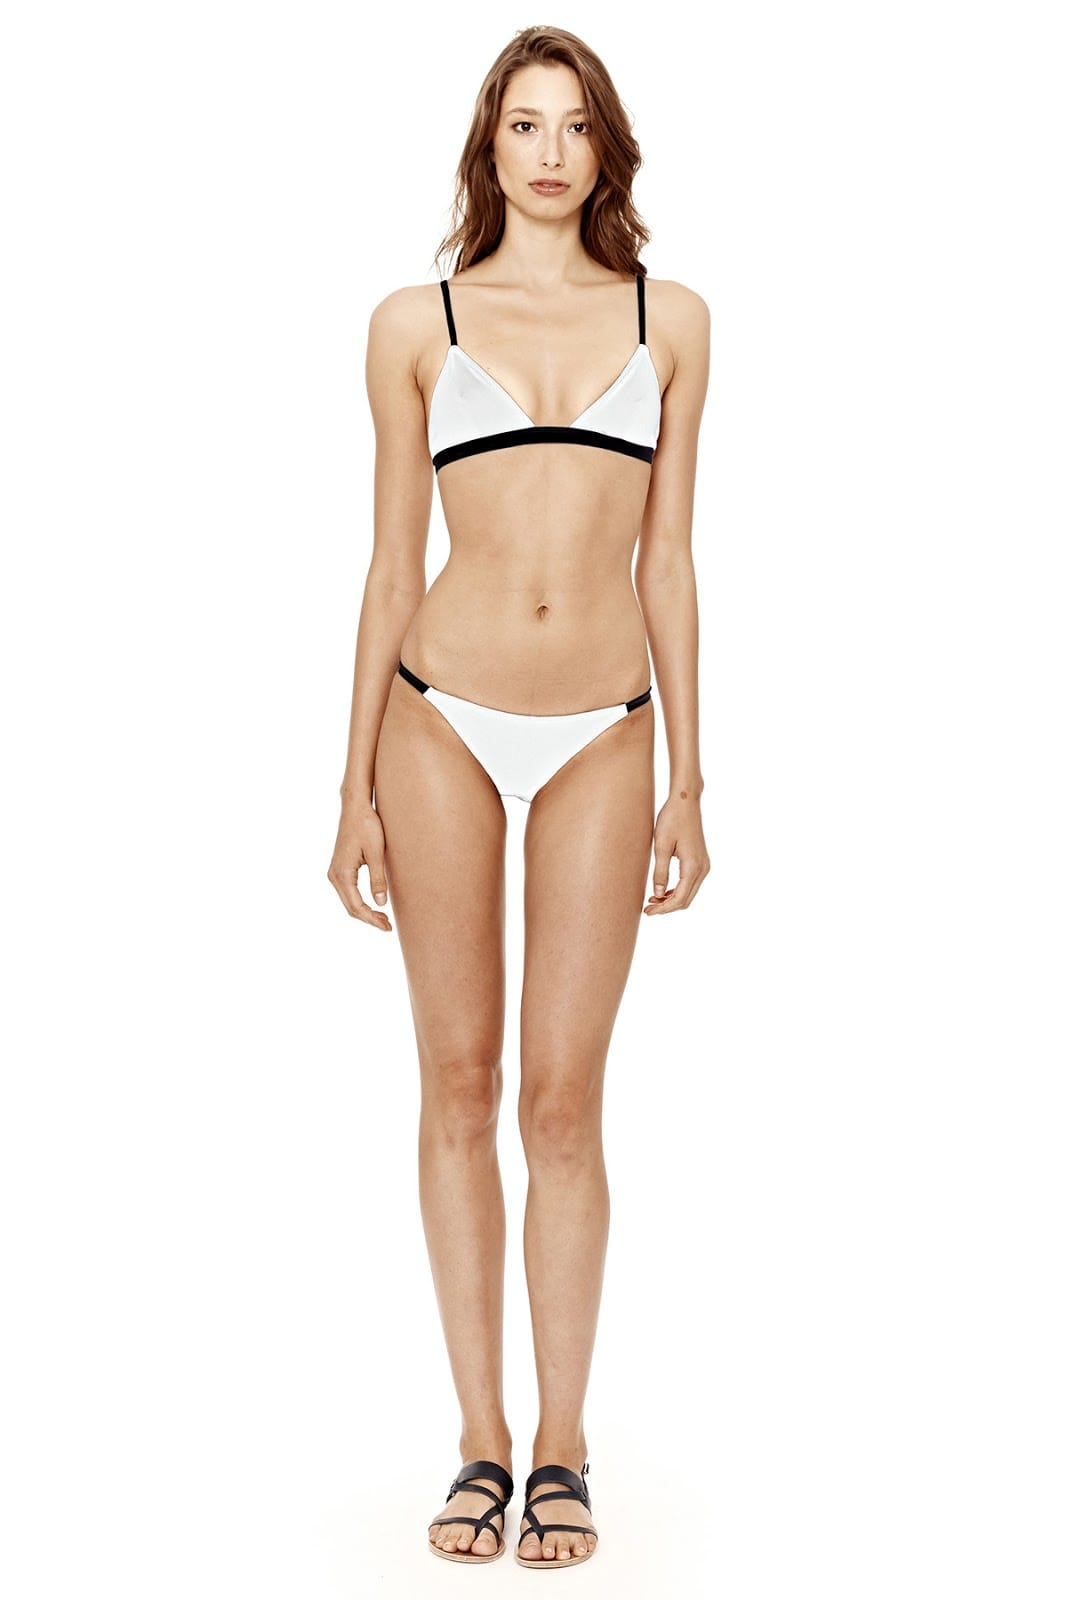 Bikini Alexandra Agoston naked (59 photo), Ass, Cleavage, Feet, see through 2020